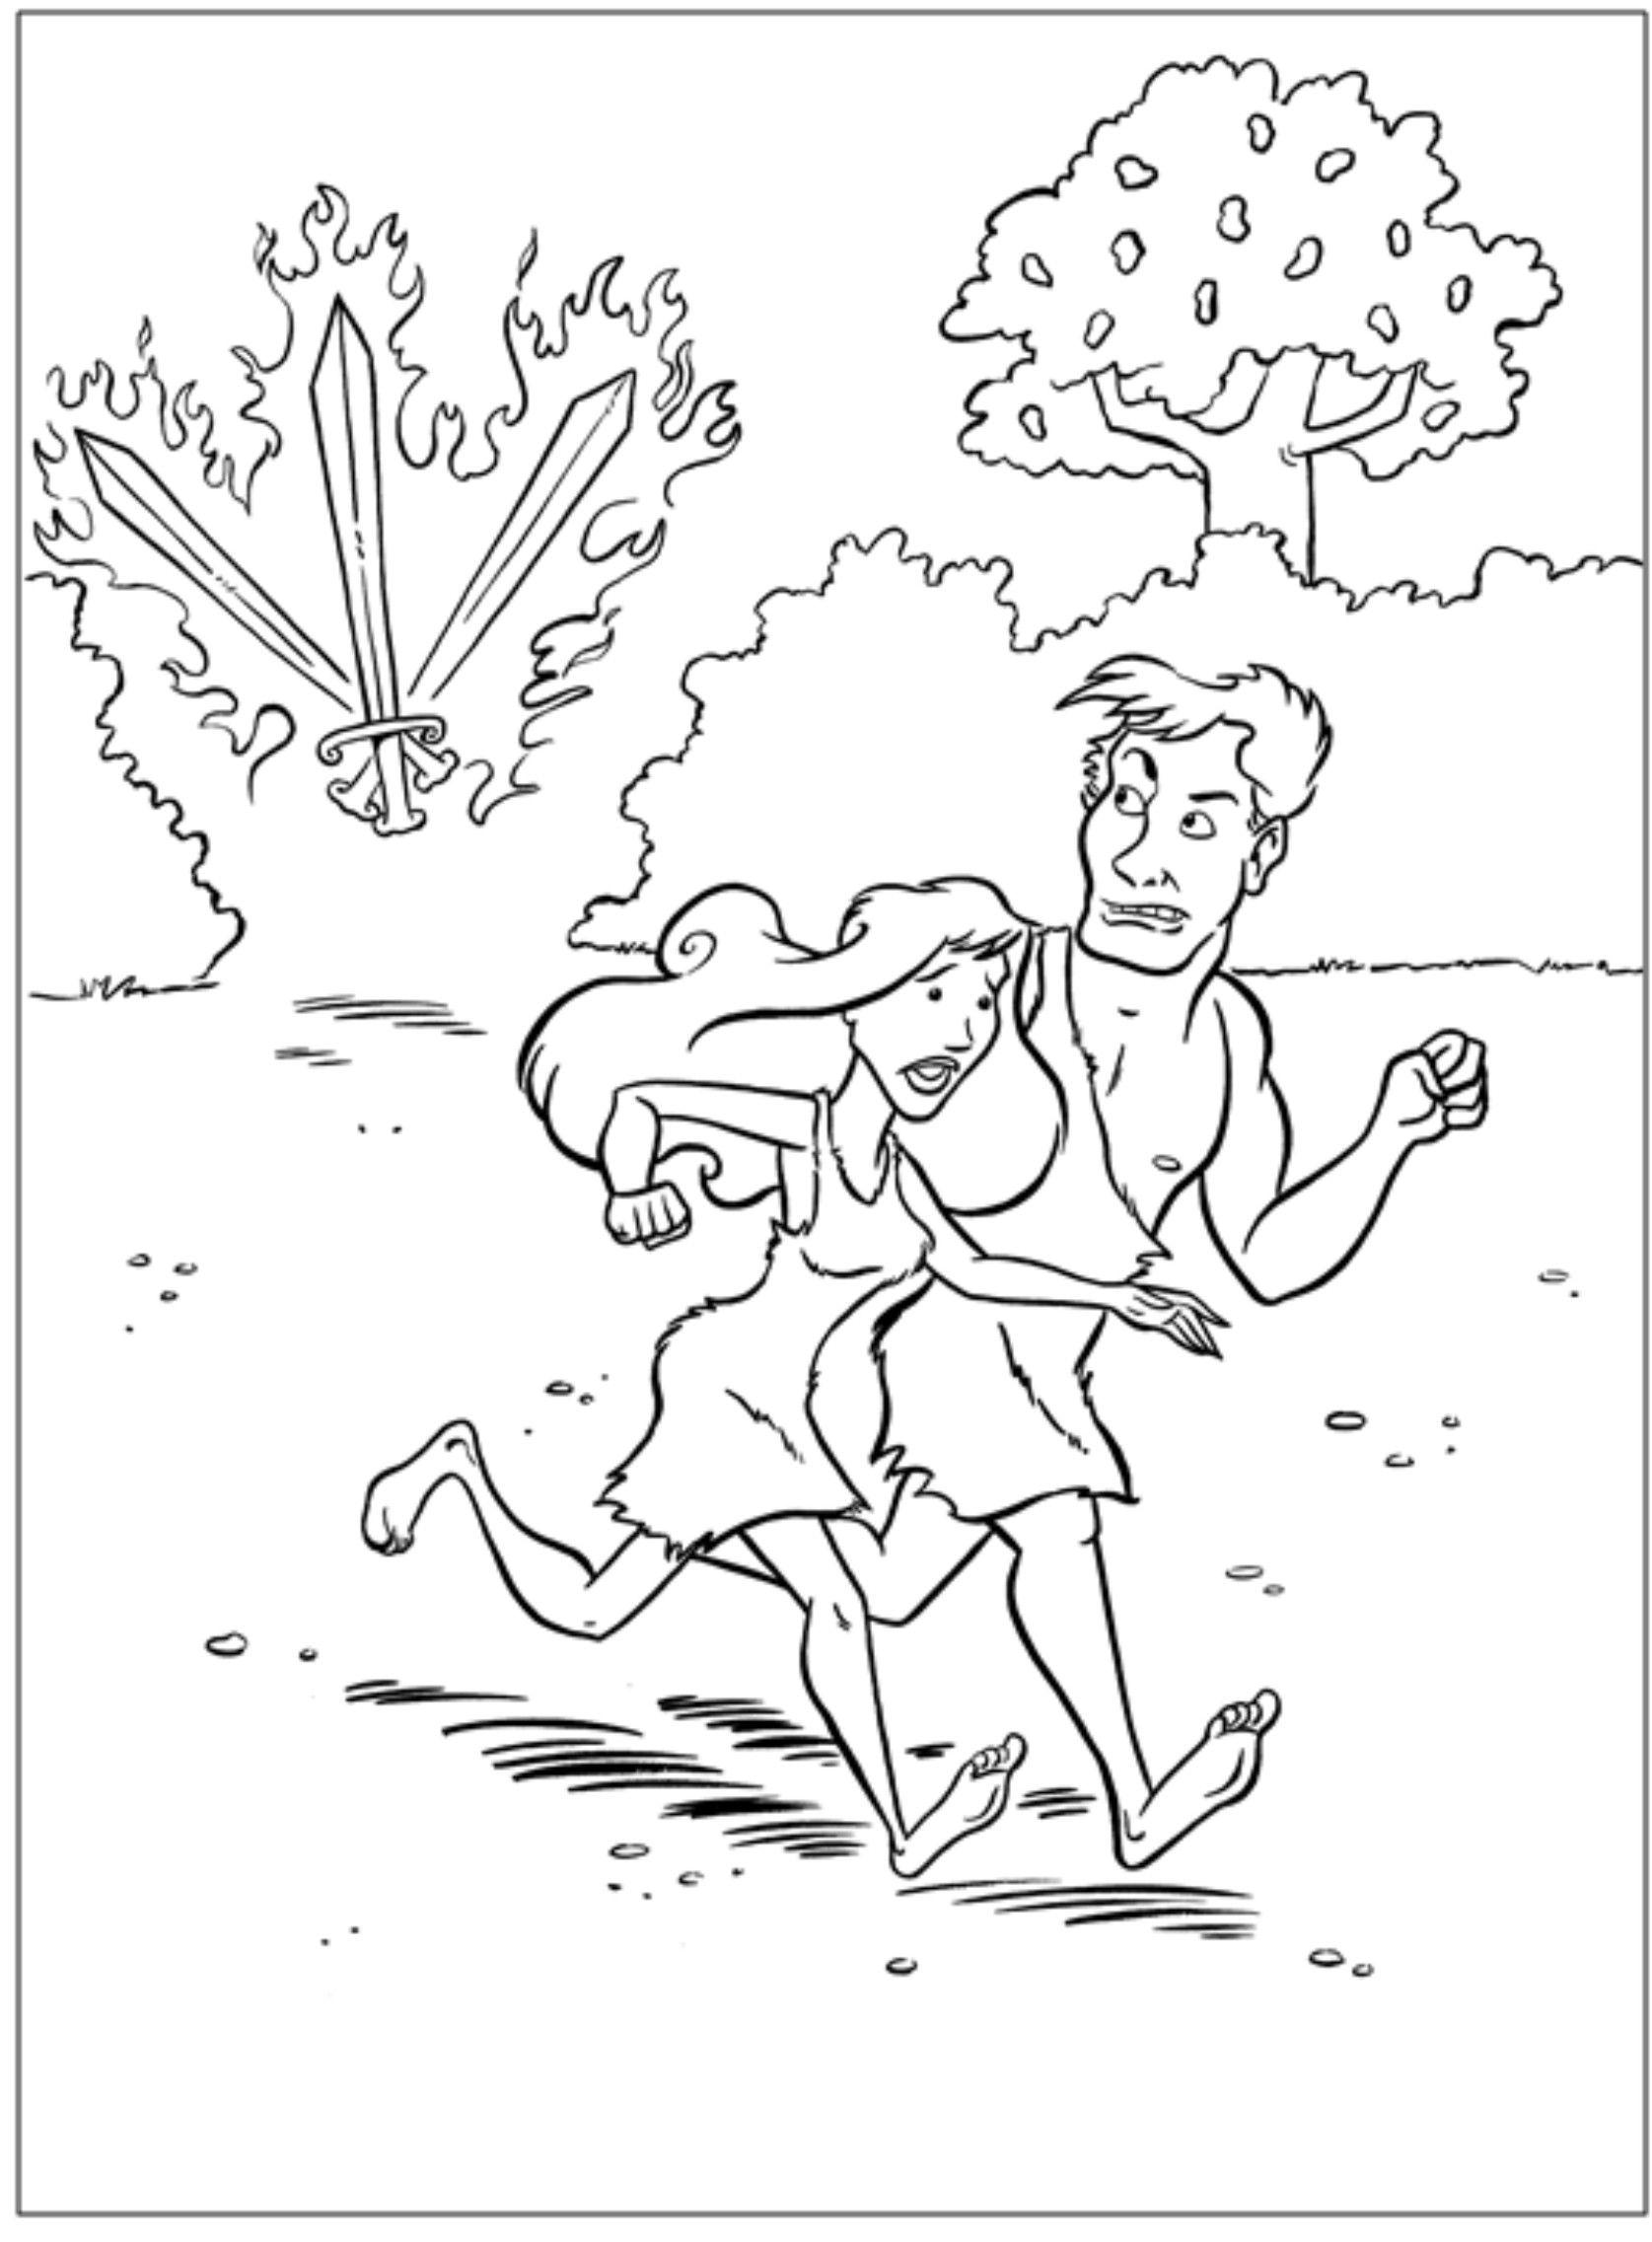 Pin de Marsha Johnson en Adam and Eve | Pinterest | Amor y Dibujo